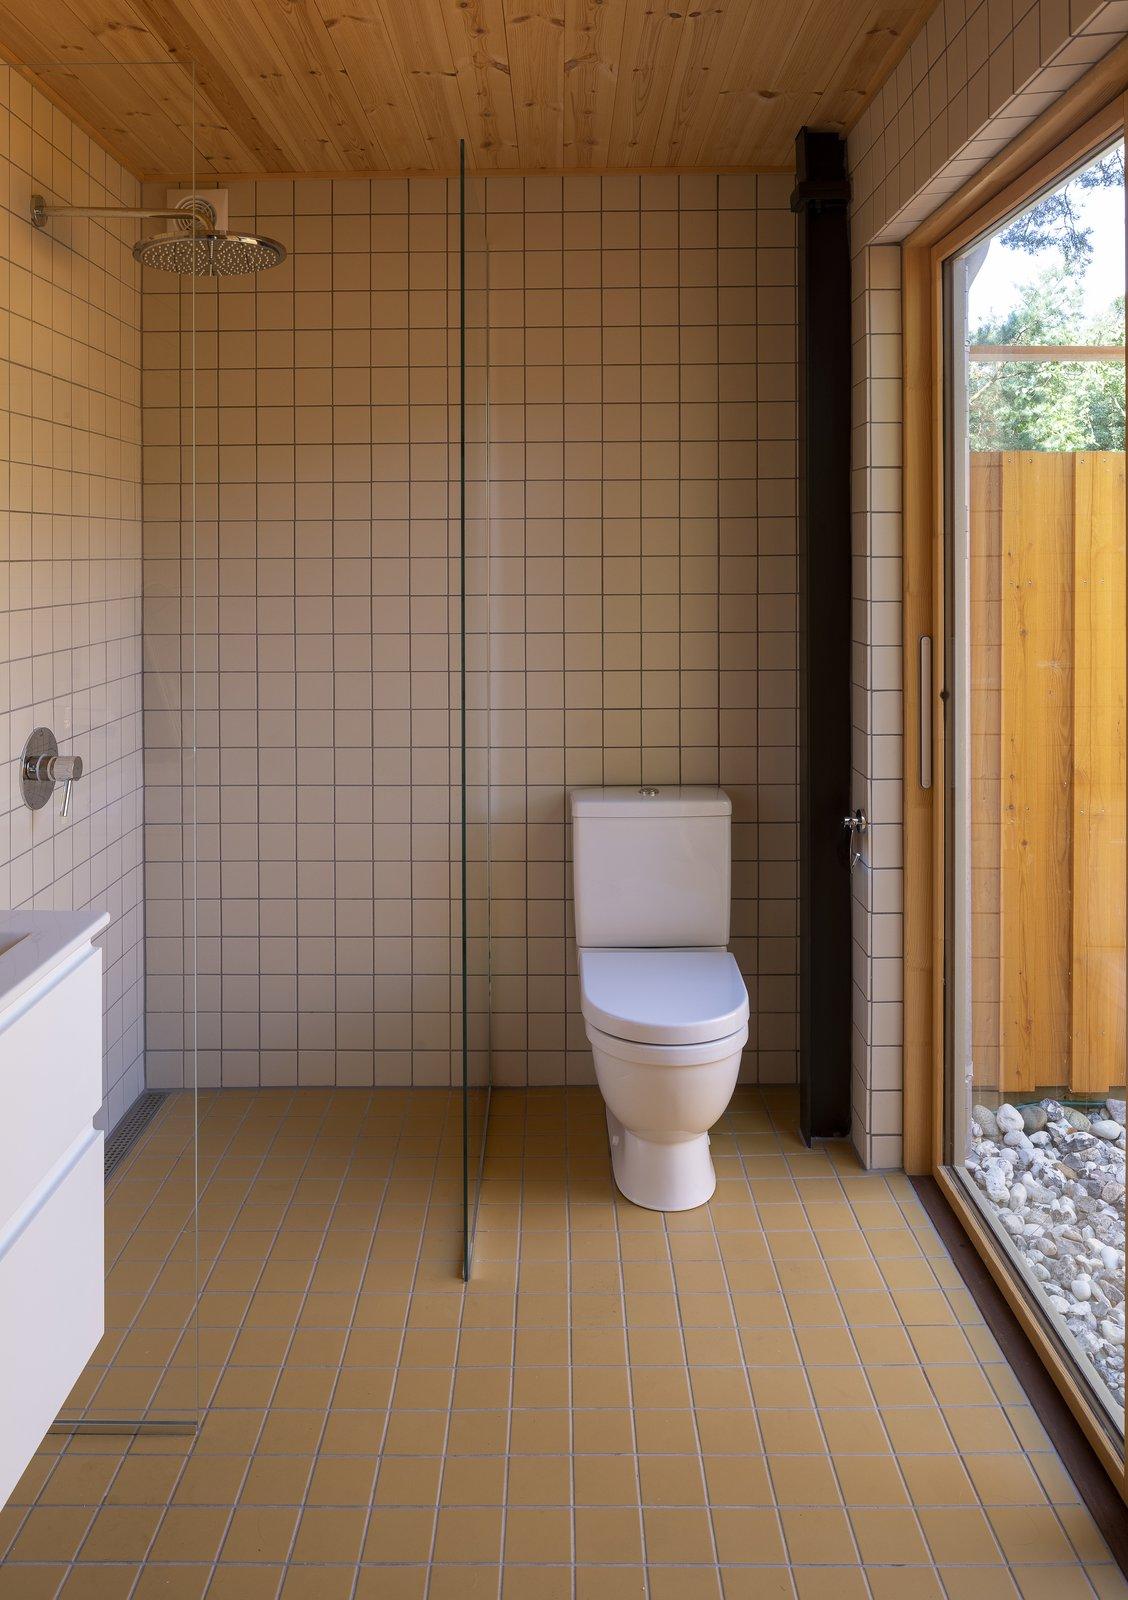 Vibo Tværve Valbæk Brørup Architects bathroom